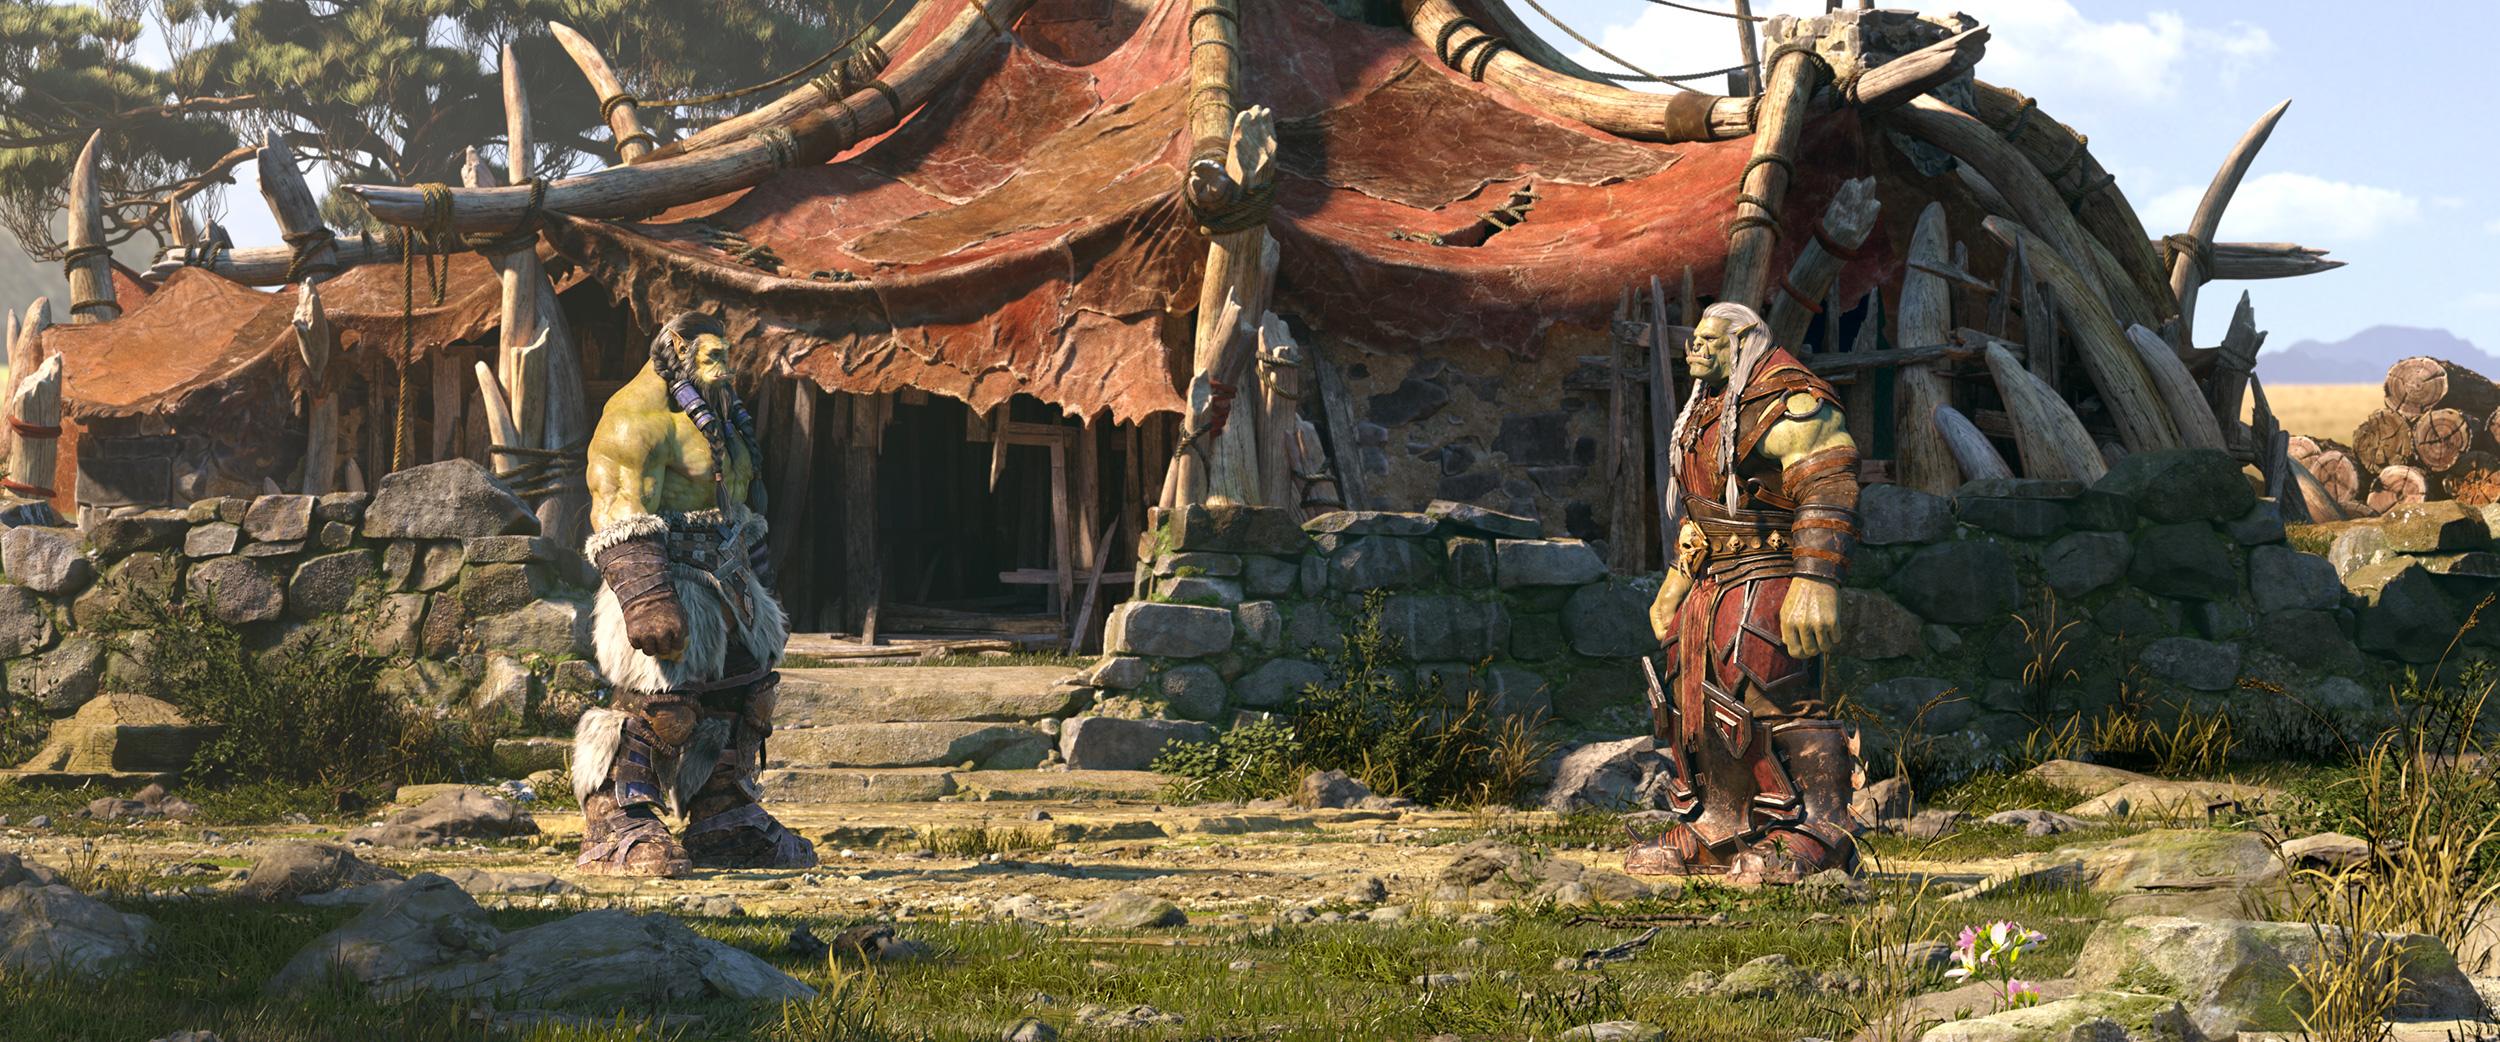 Saurcroc informe Thrall de la situation de la Horde